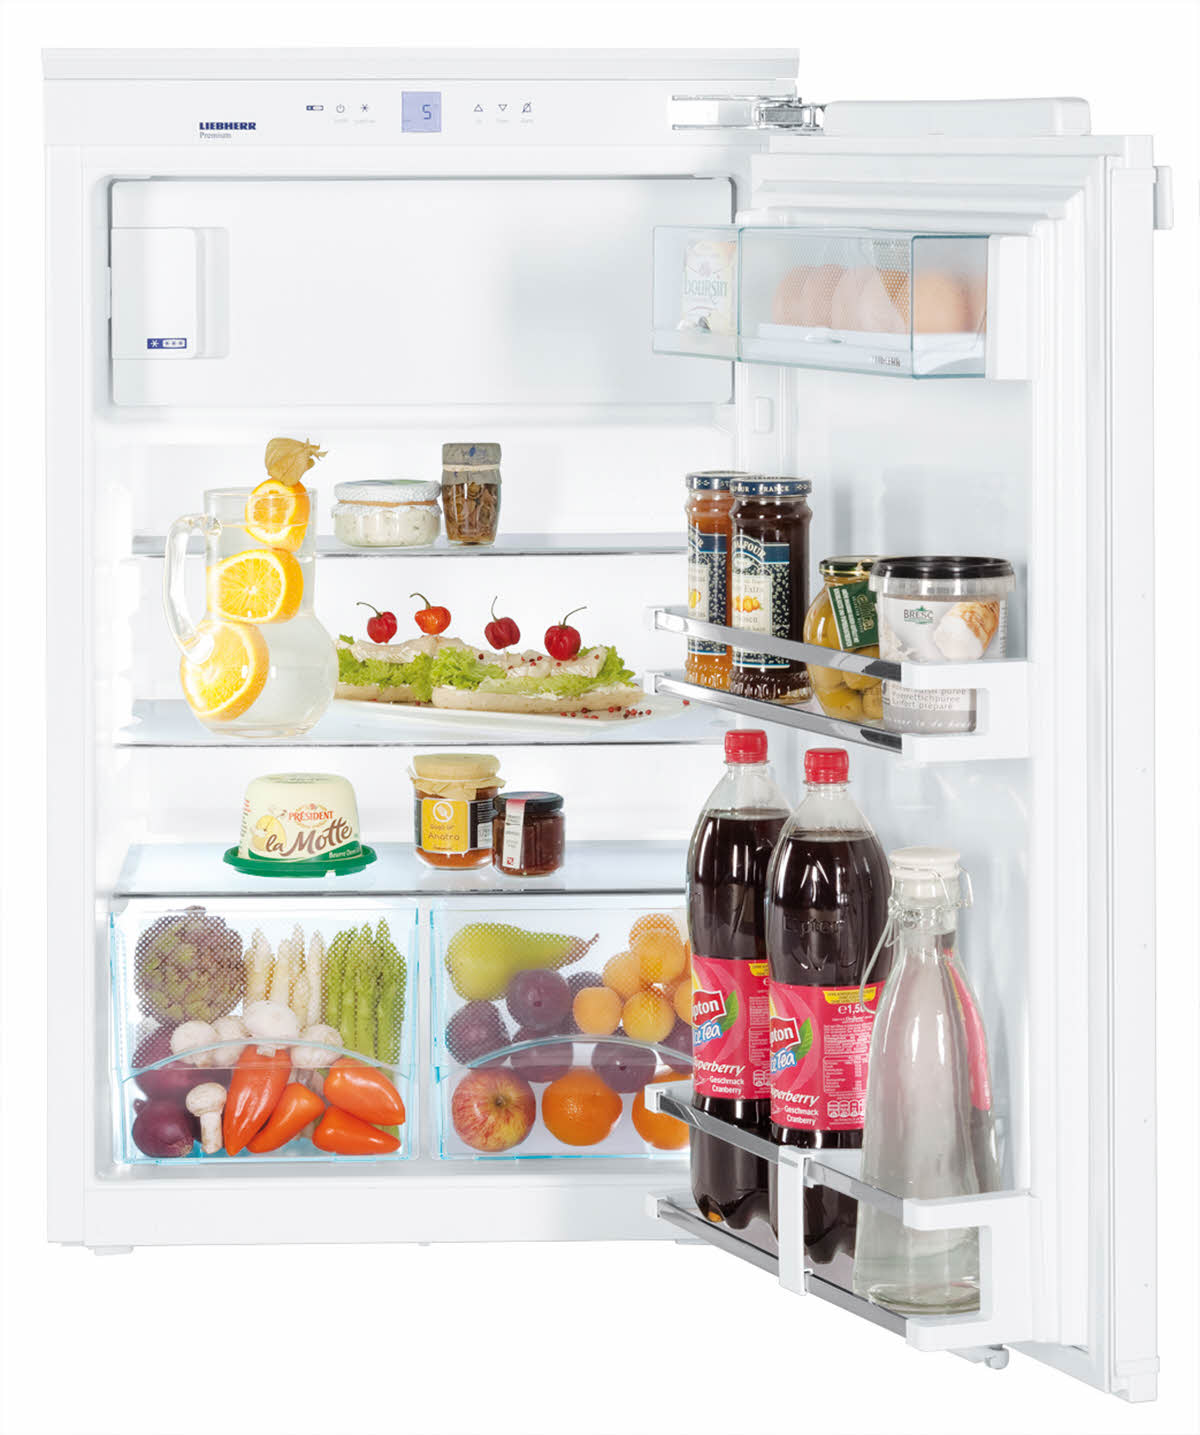 Einbau Kühlschränke – Heydorn&Hoeco